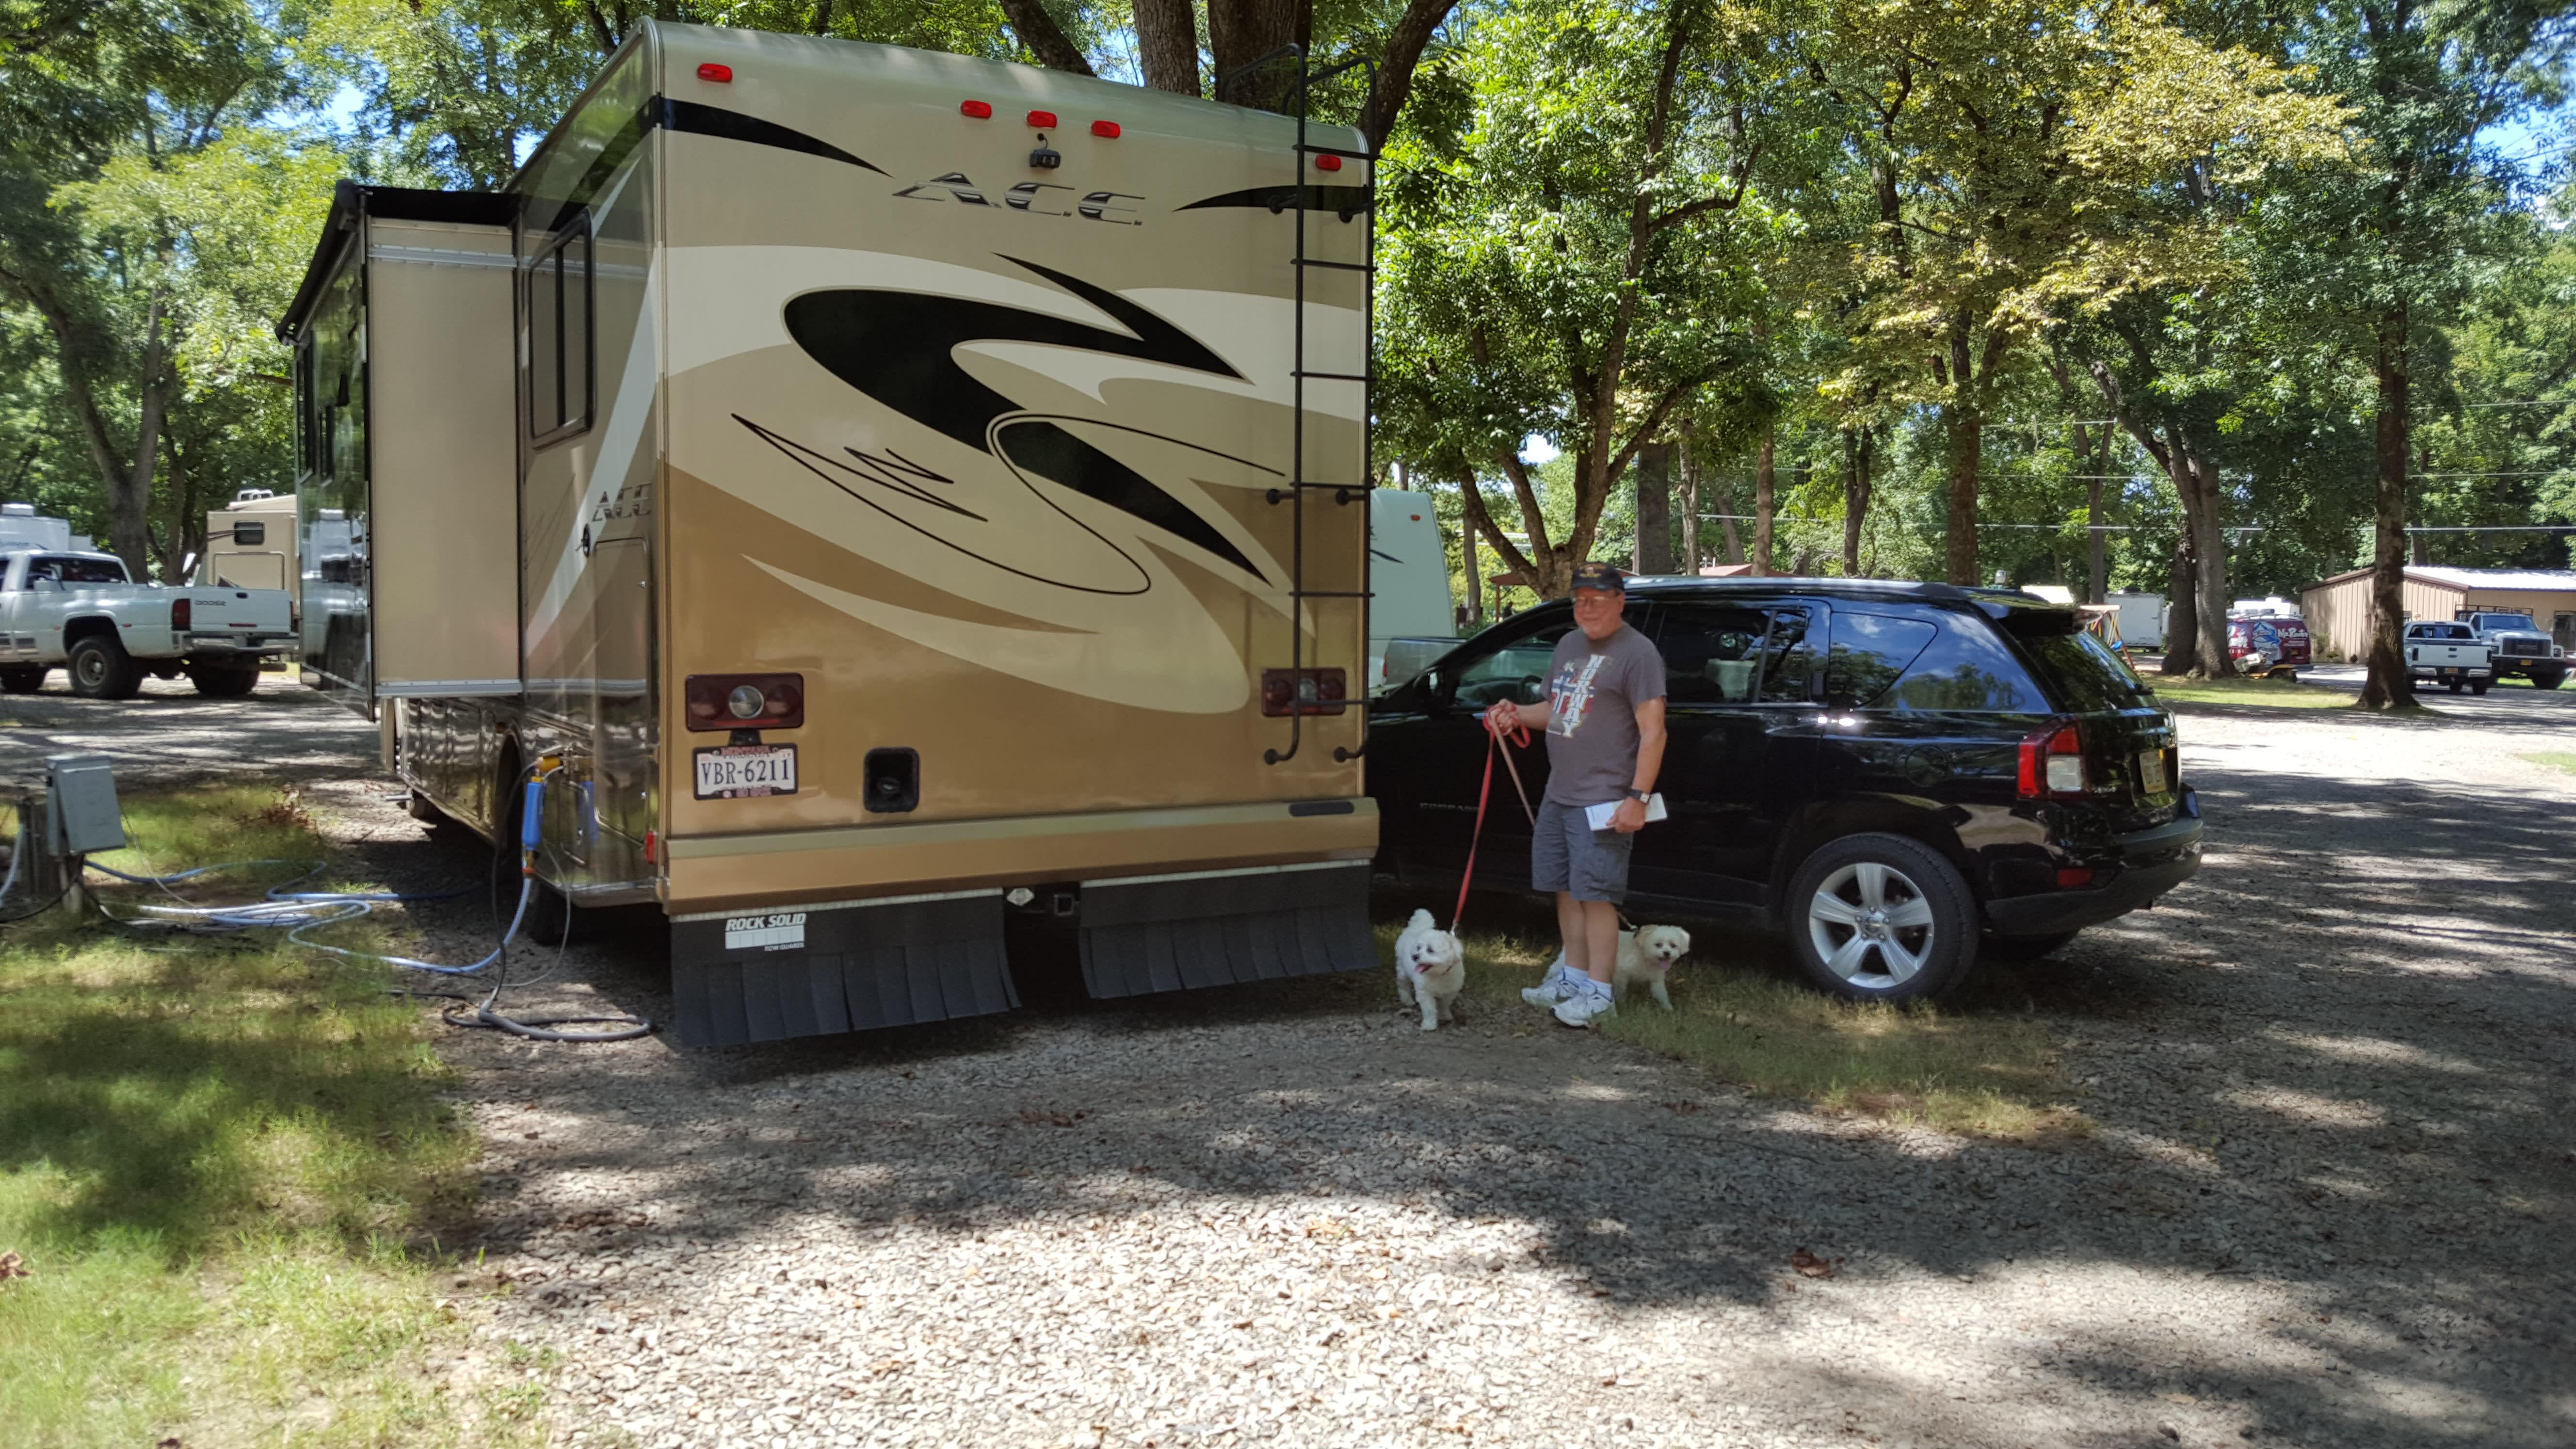 At a Camp Site. Thor Motor Coach A.C.E 2013